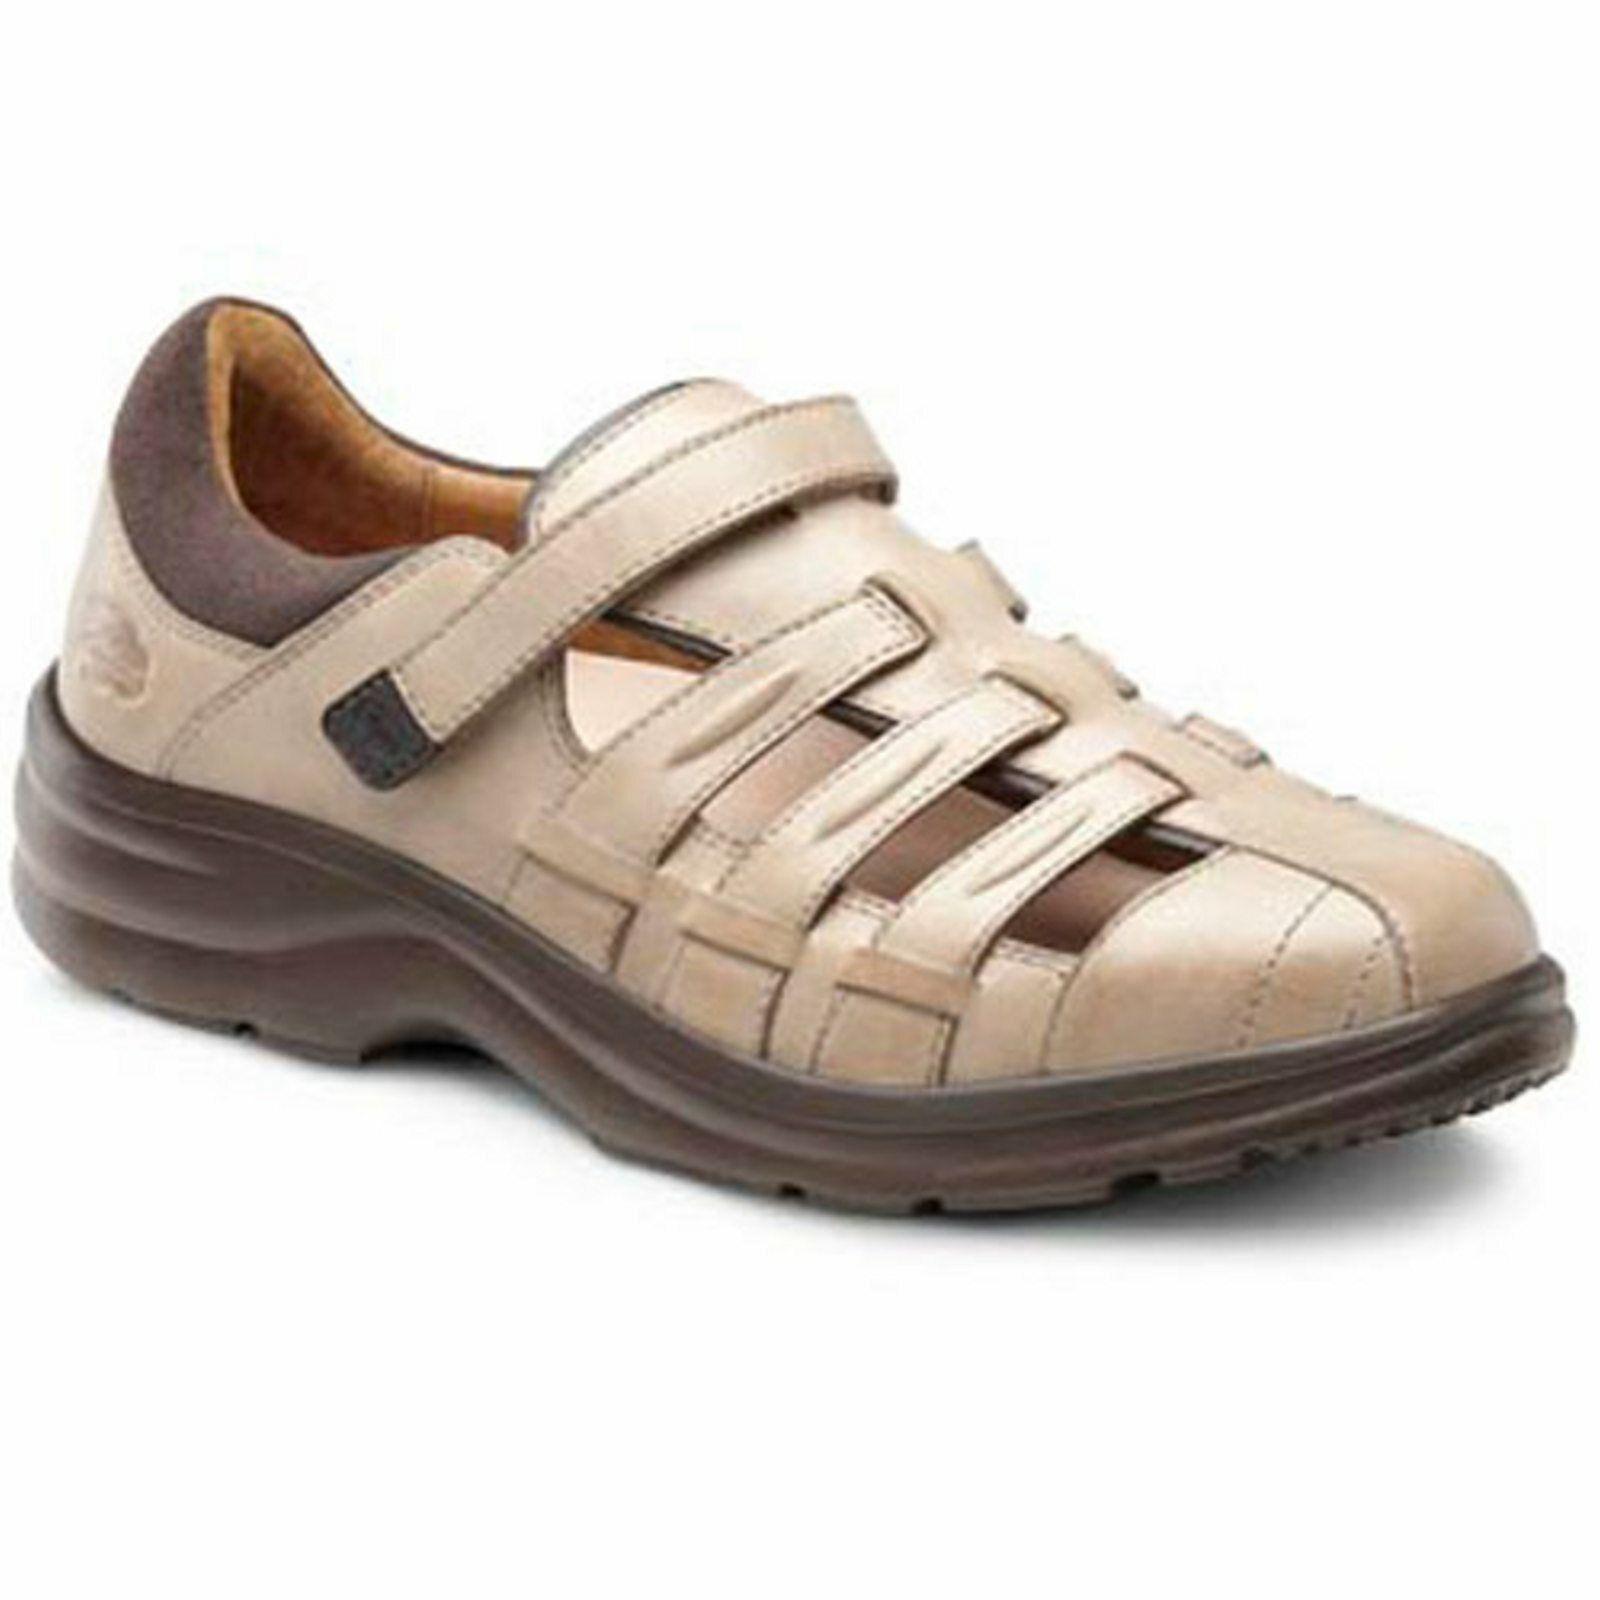 Dr. Comfort Breeze Women's Casual Sandal